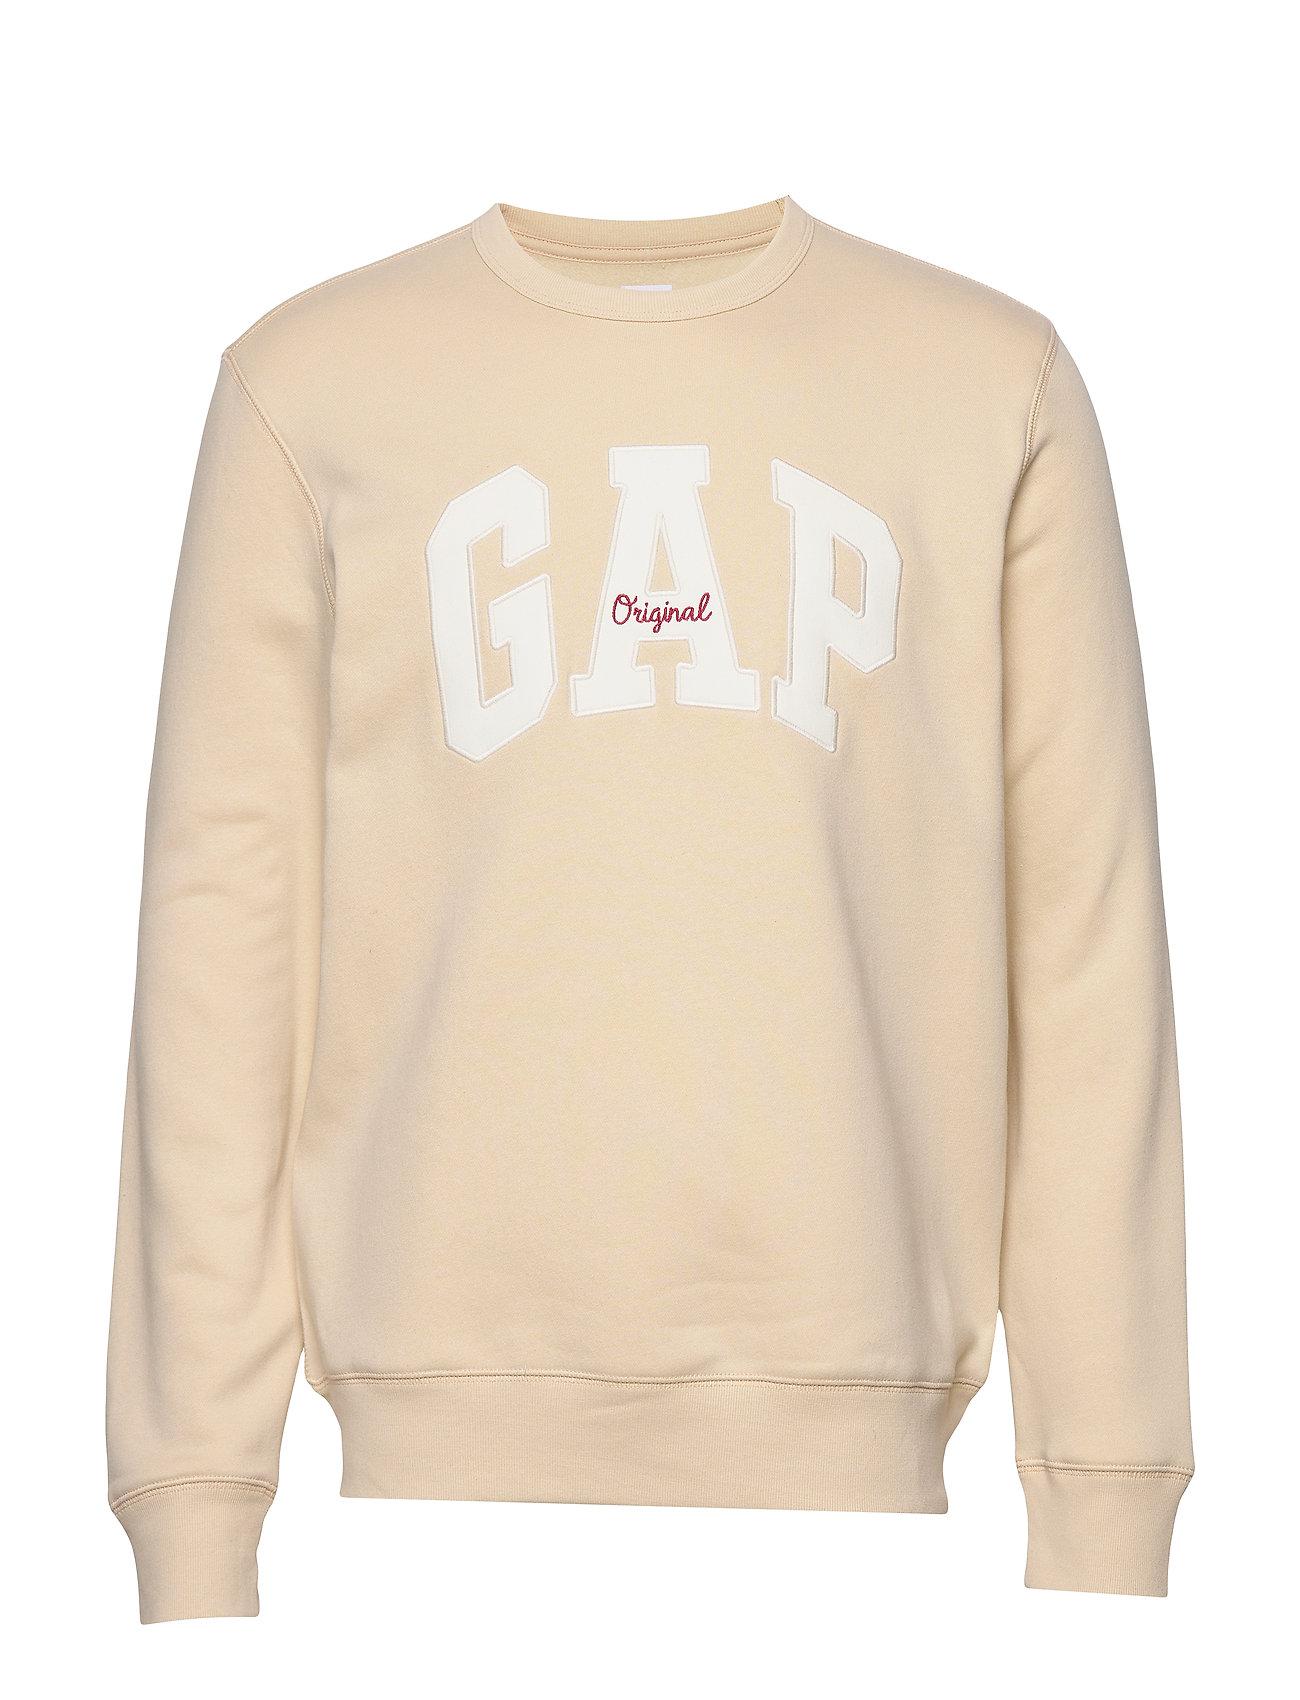 GAP Gap Logo Fleece Crewneck Sweatshirt - ECRU 033